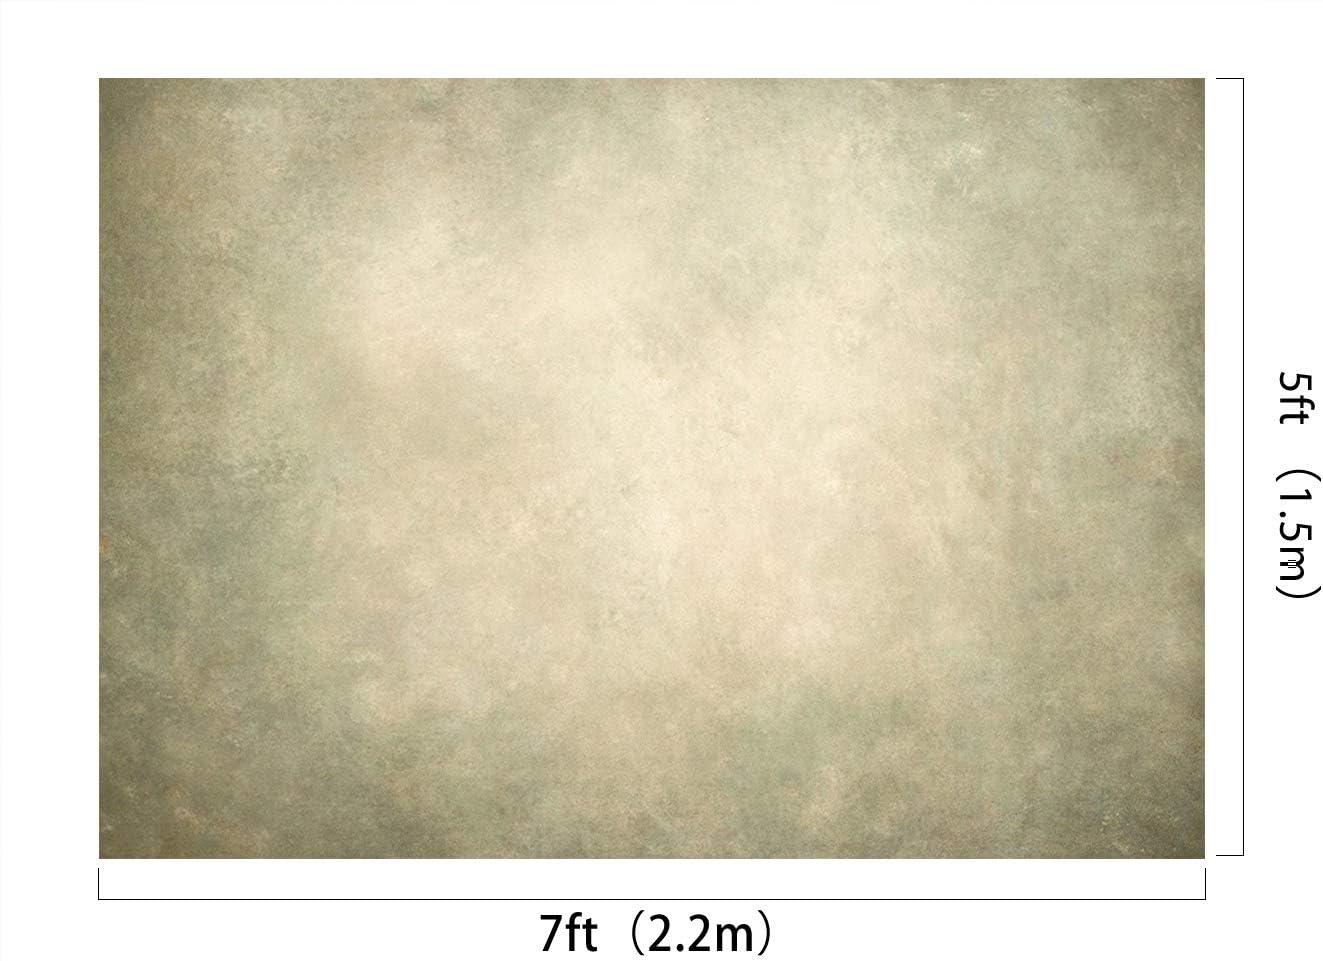 Beige Fondos Fotograf/ía Abstracta Tel/ón de Fondo Fotograf/ía Telones de Fondo Fotograf/ía de Microfibra Estudio Marfil Blanco Retrato Fondo Fotografia Kate 7/×5ft 2.2/×1.5m